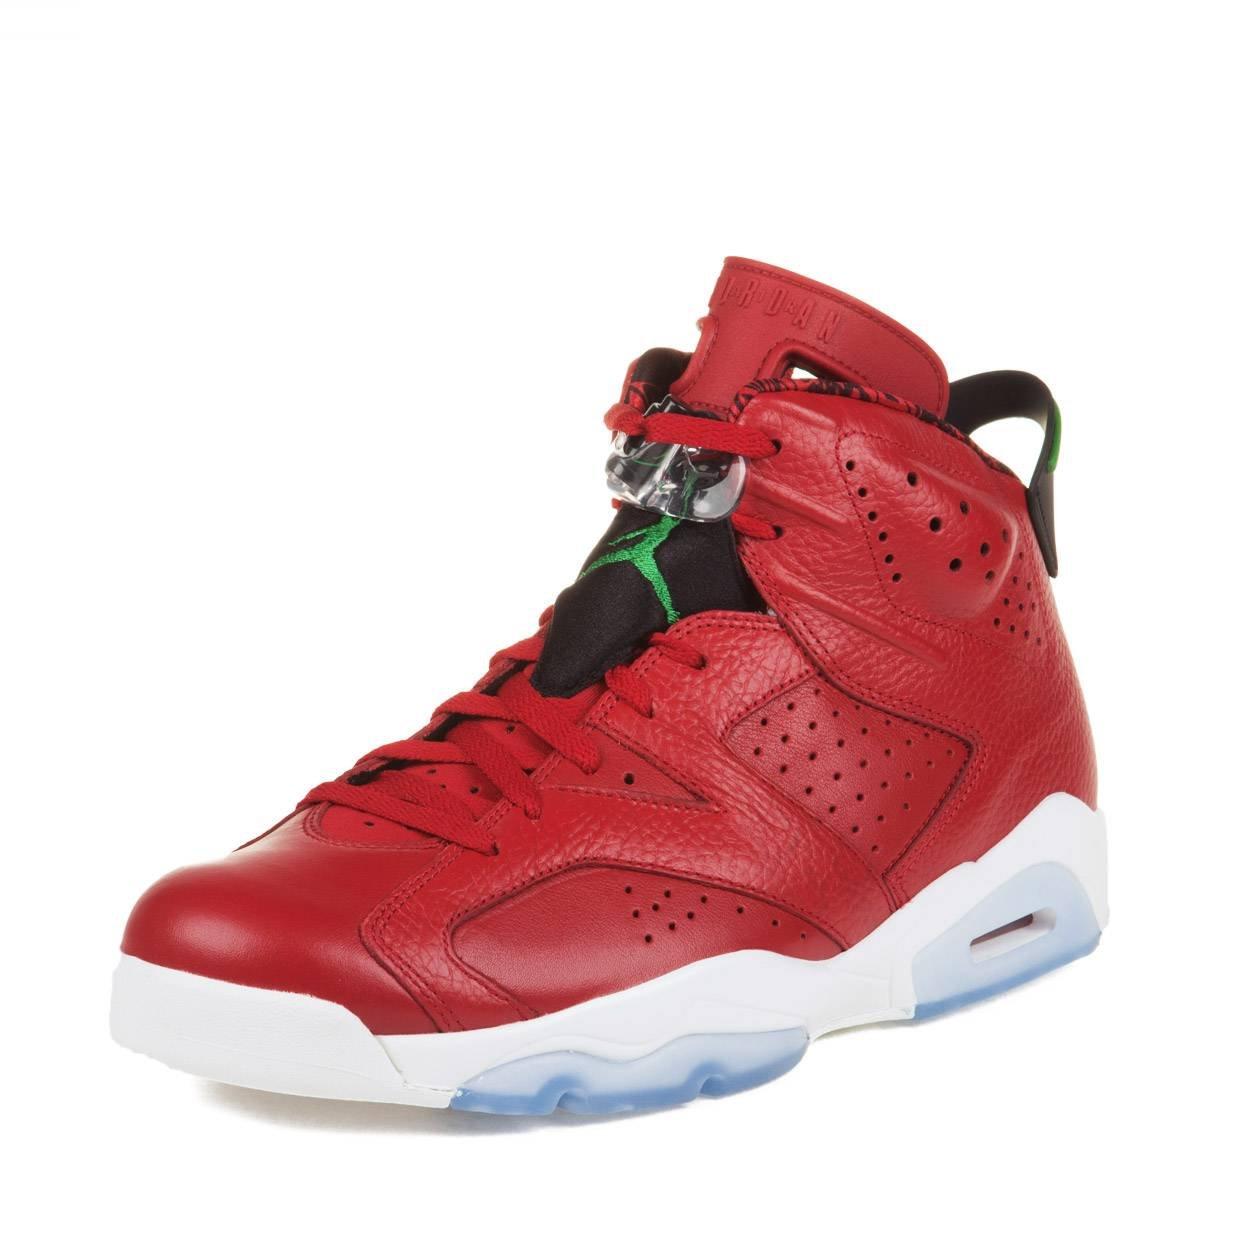 brand new 06292 8eb9d Nike Air Jordan 6 Retro Spizike